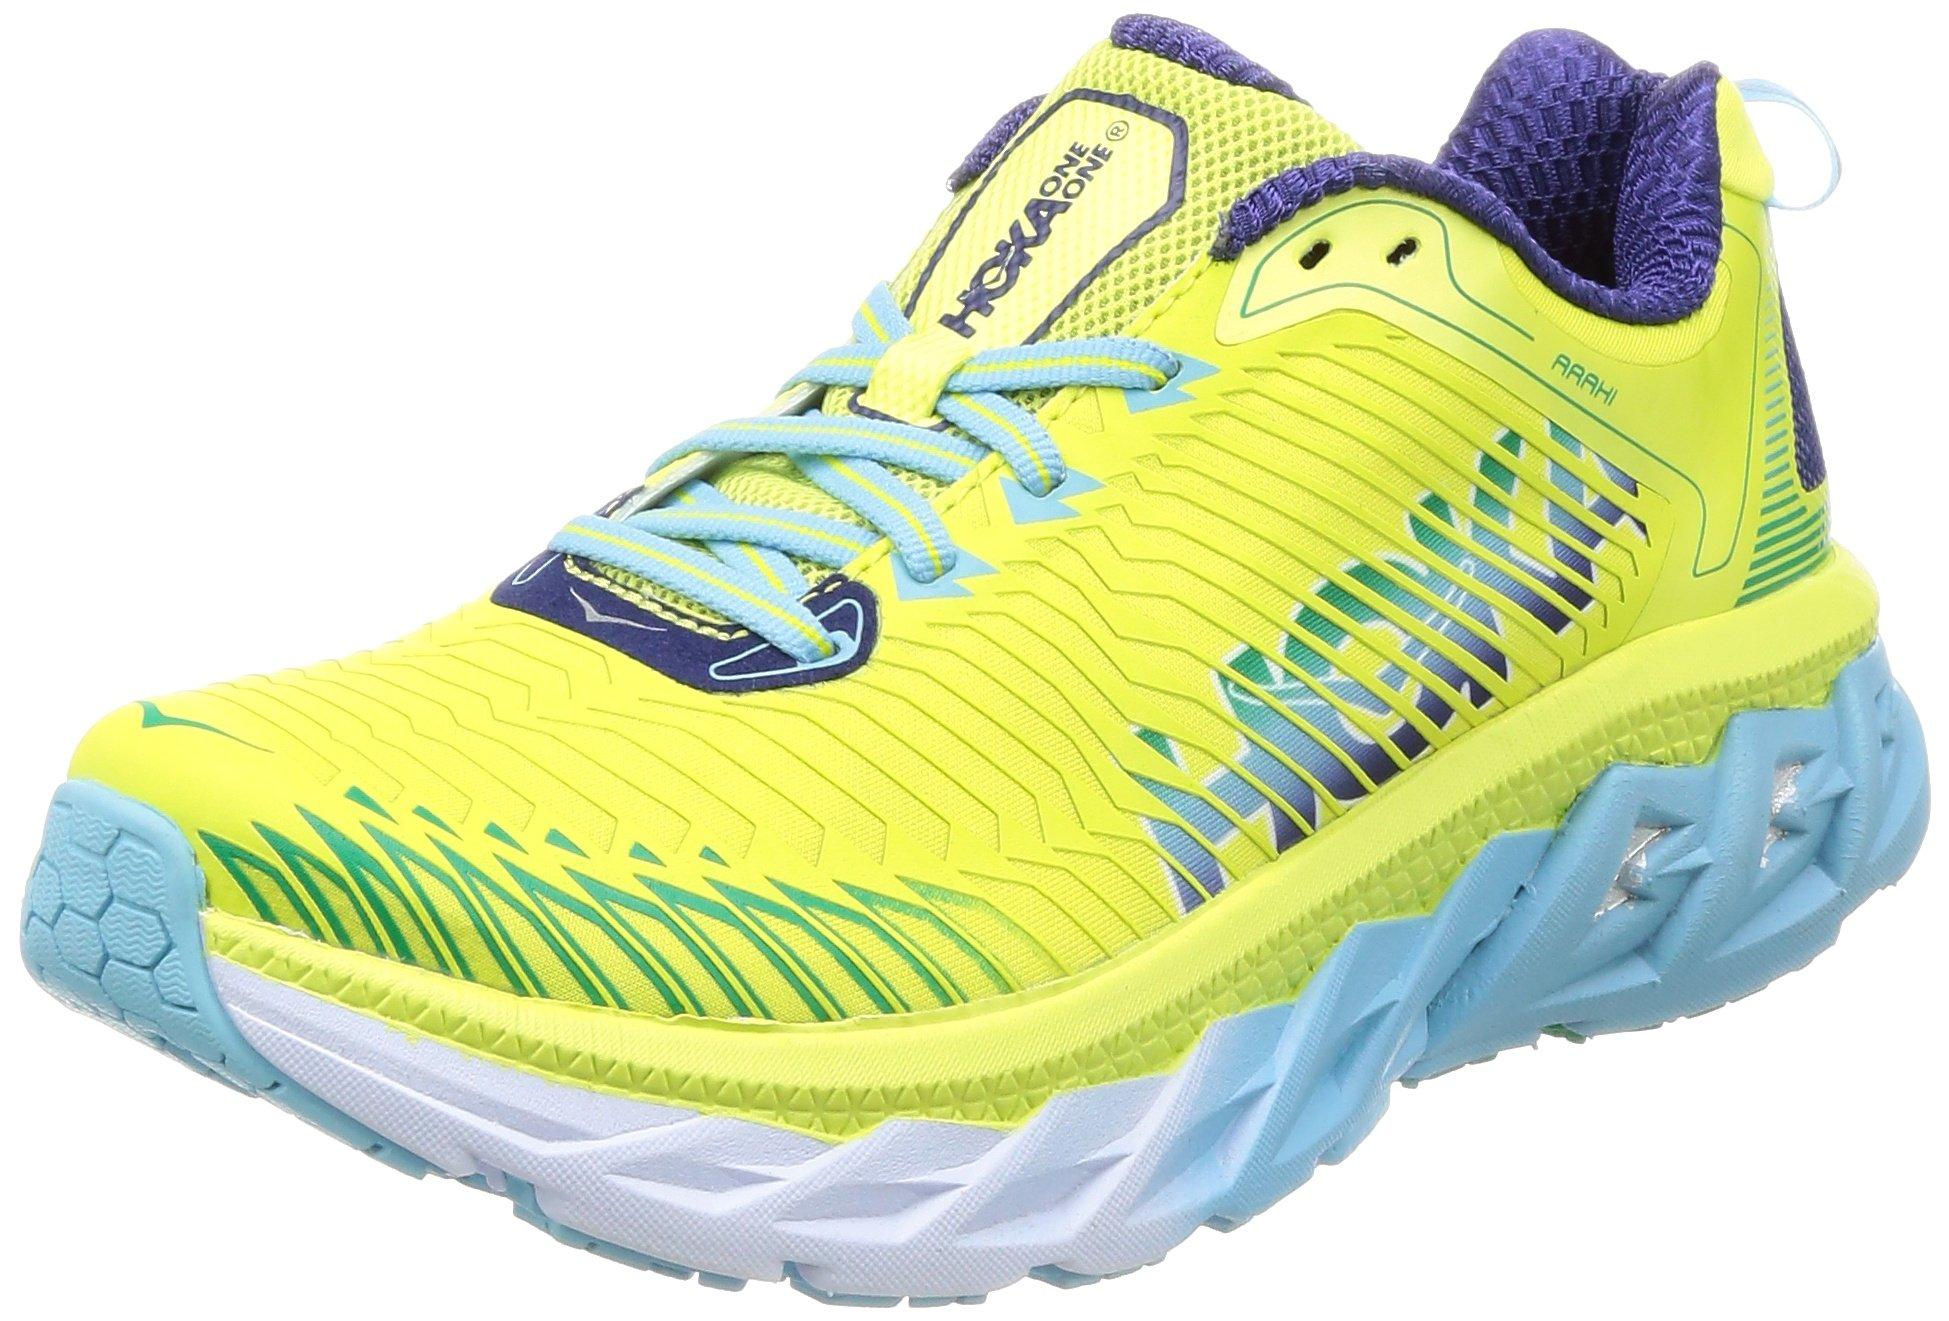 Women's Hoka One One Arahi Running Shoe Sunny Lime/Blue Topaz Size 7.5 M US